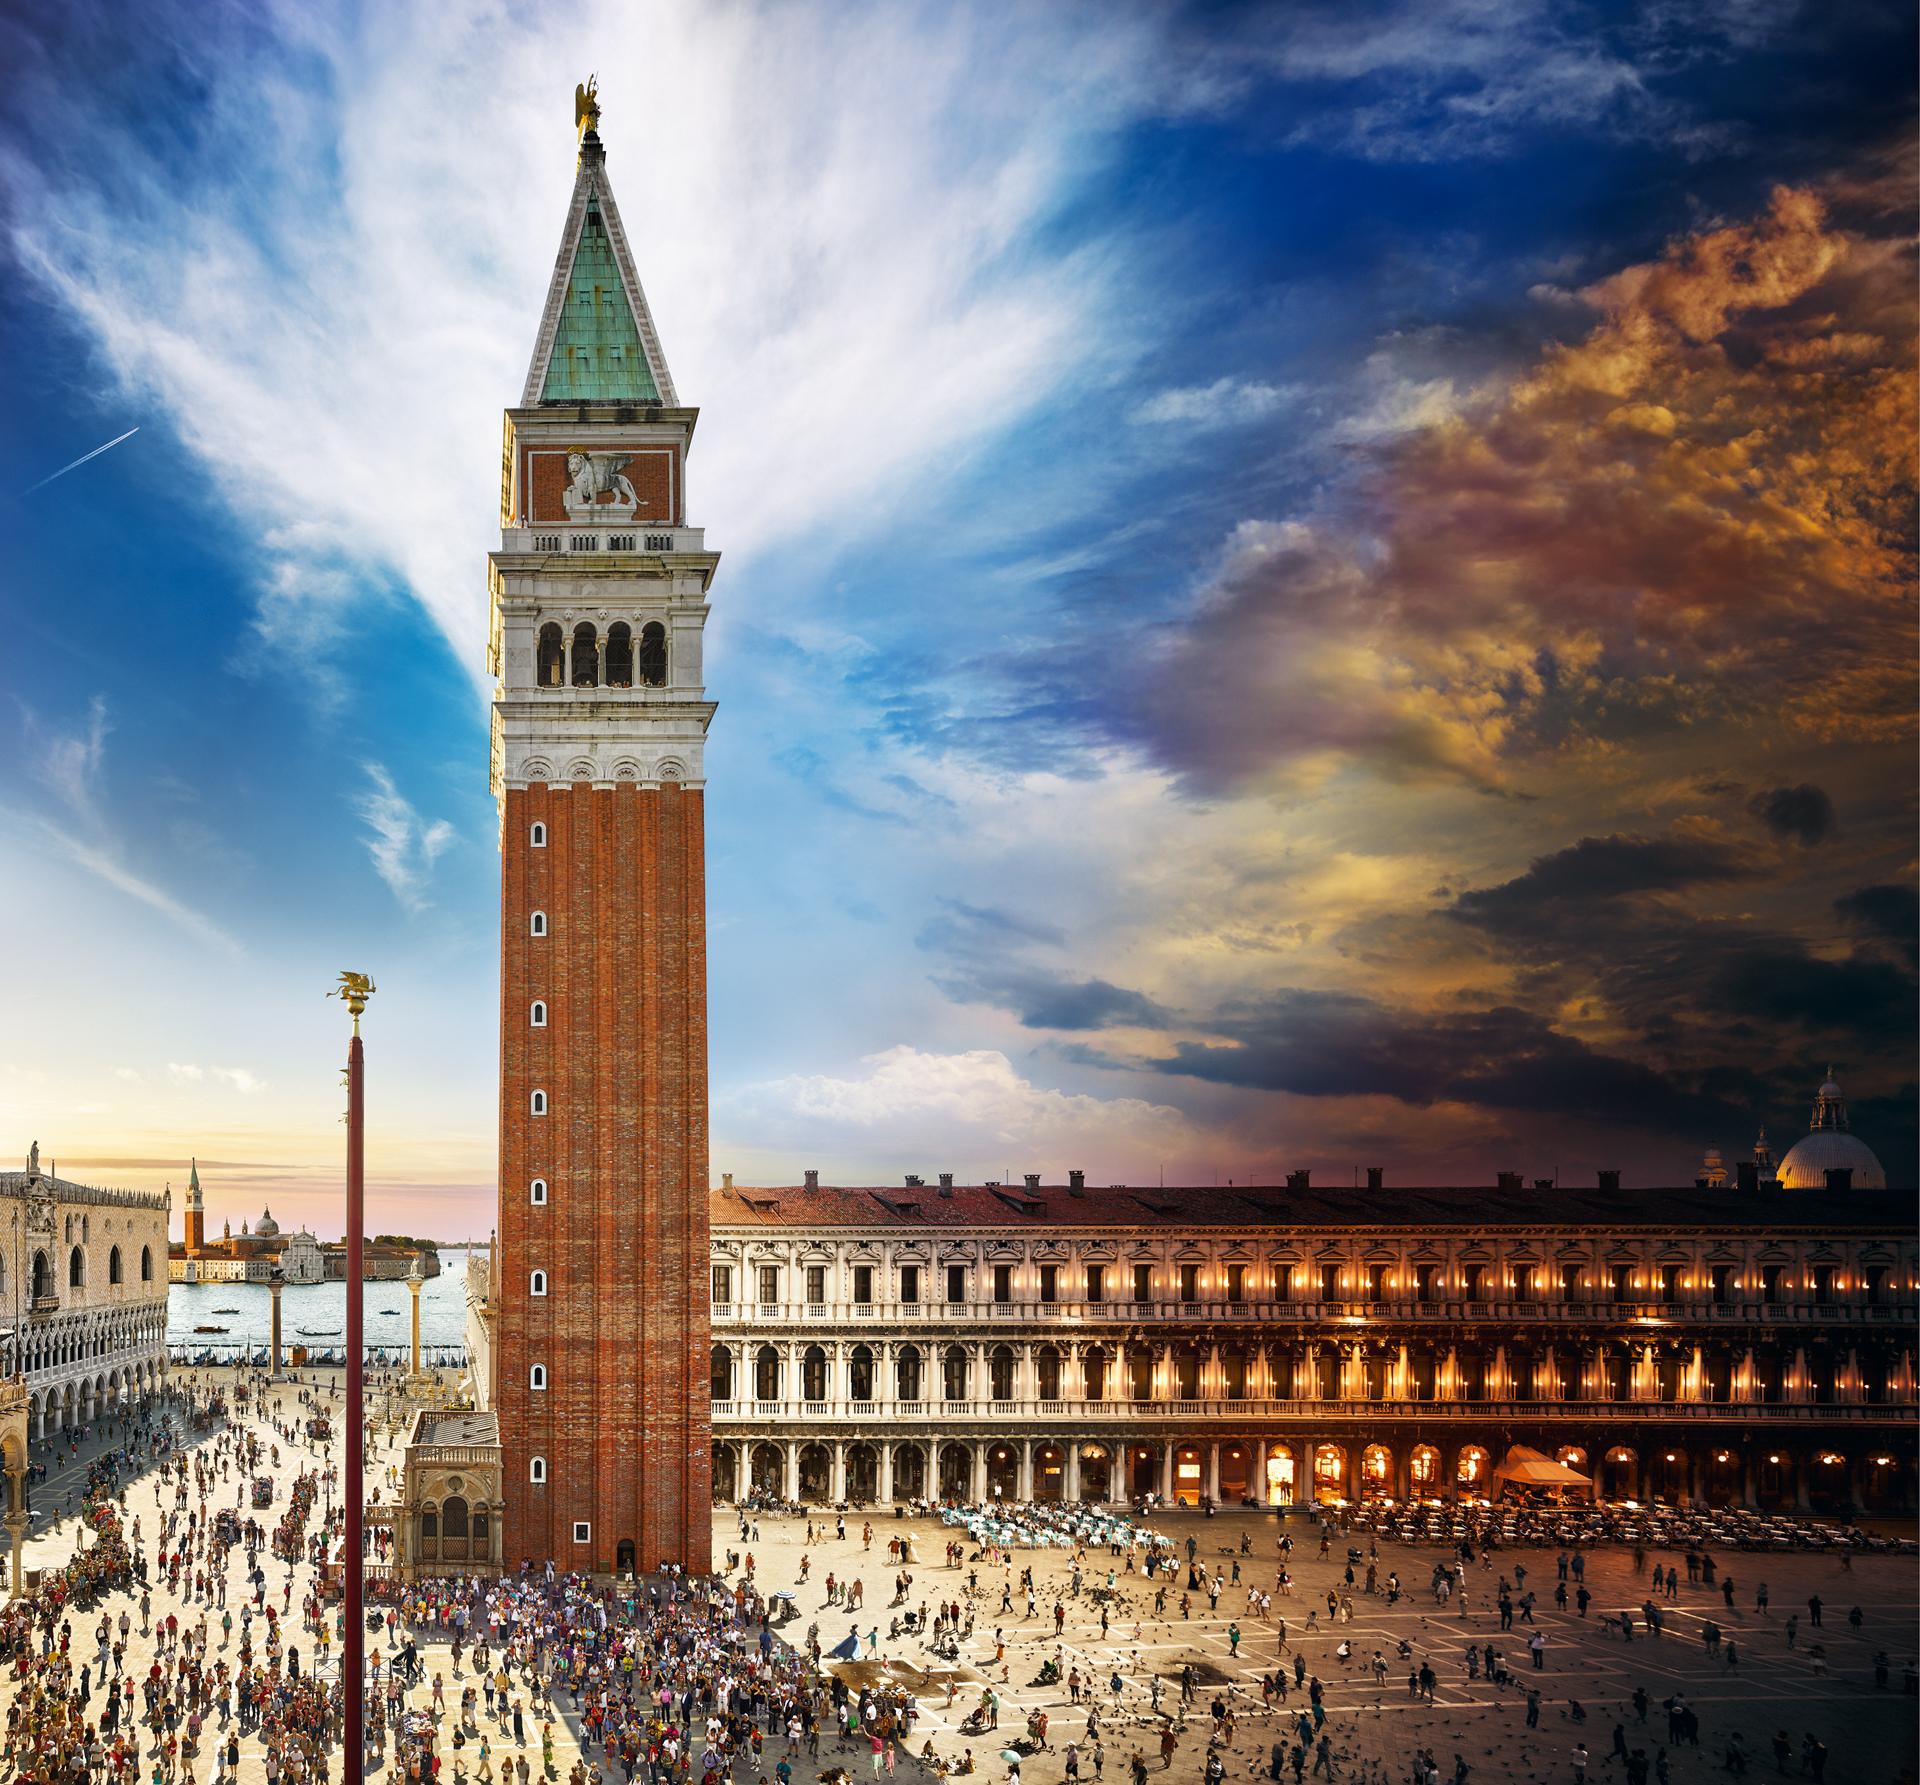 Campanile di San Marco, Venice, Day to Night 2016